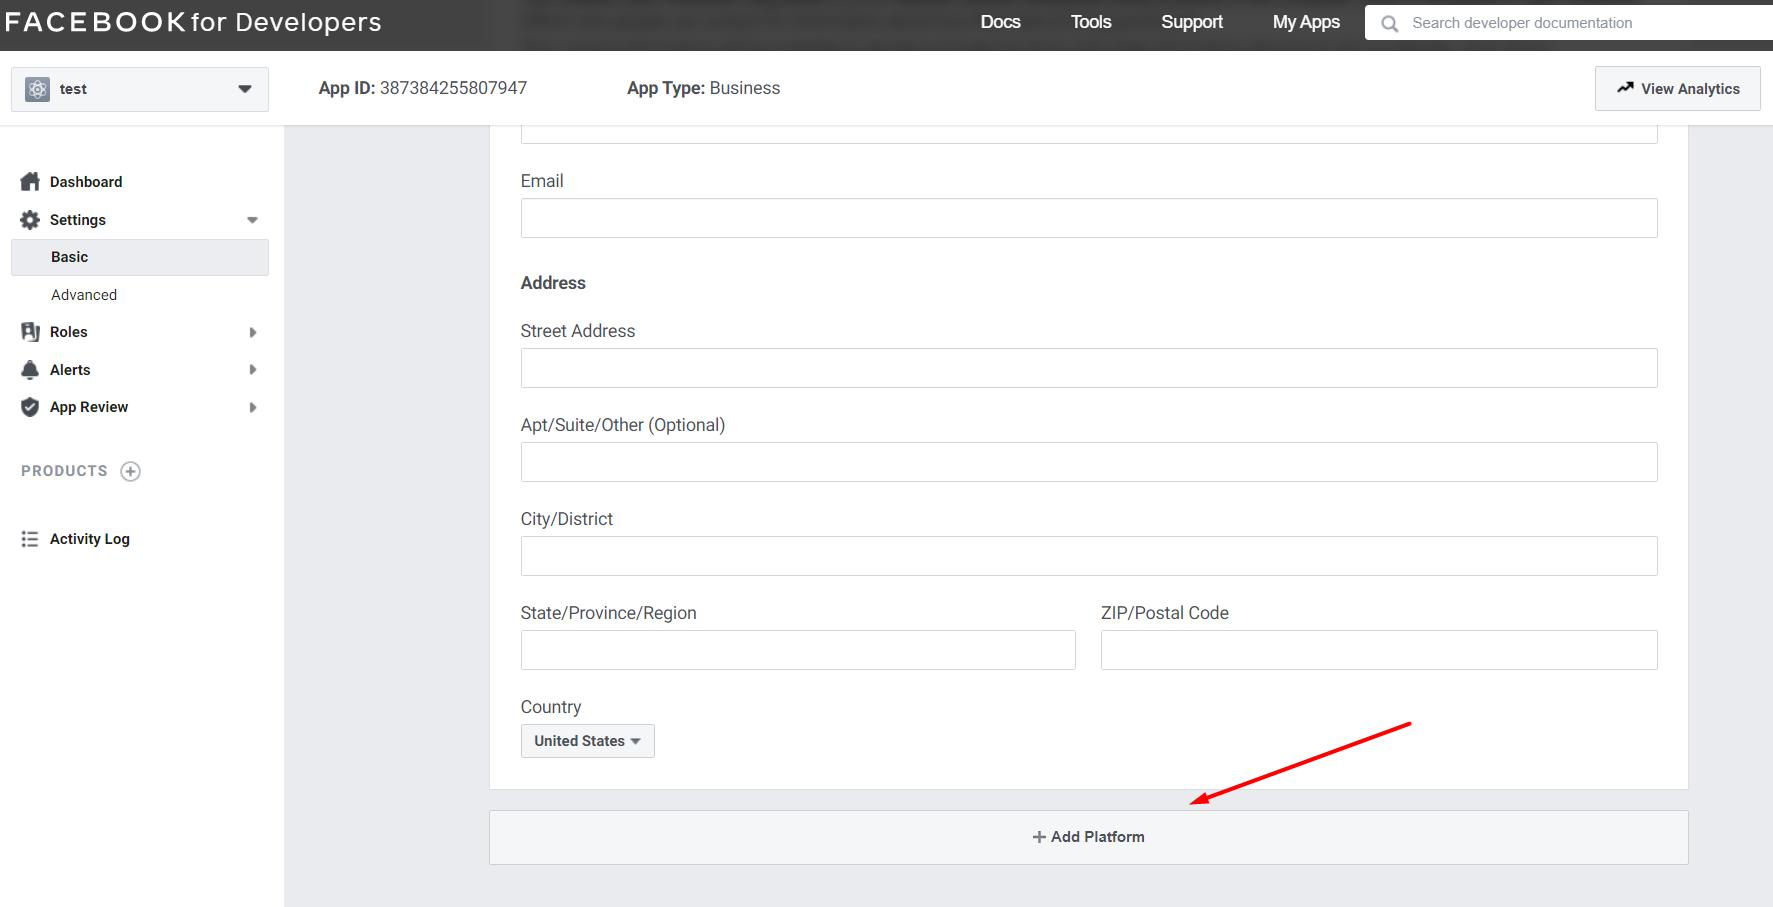 Facebook - How to add platform